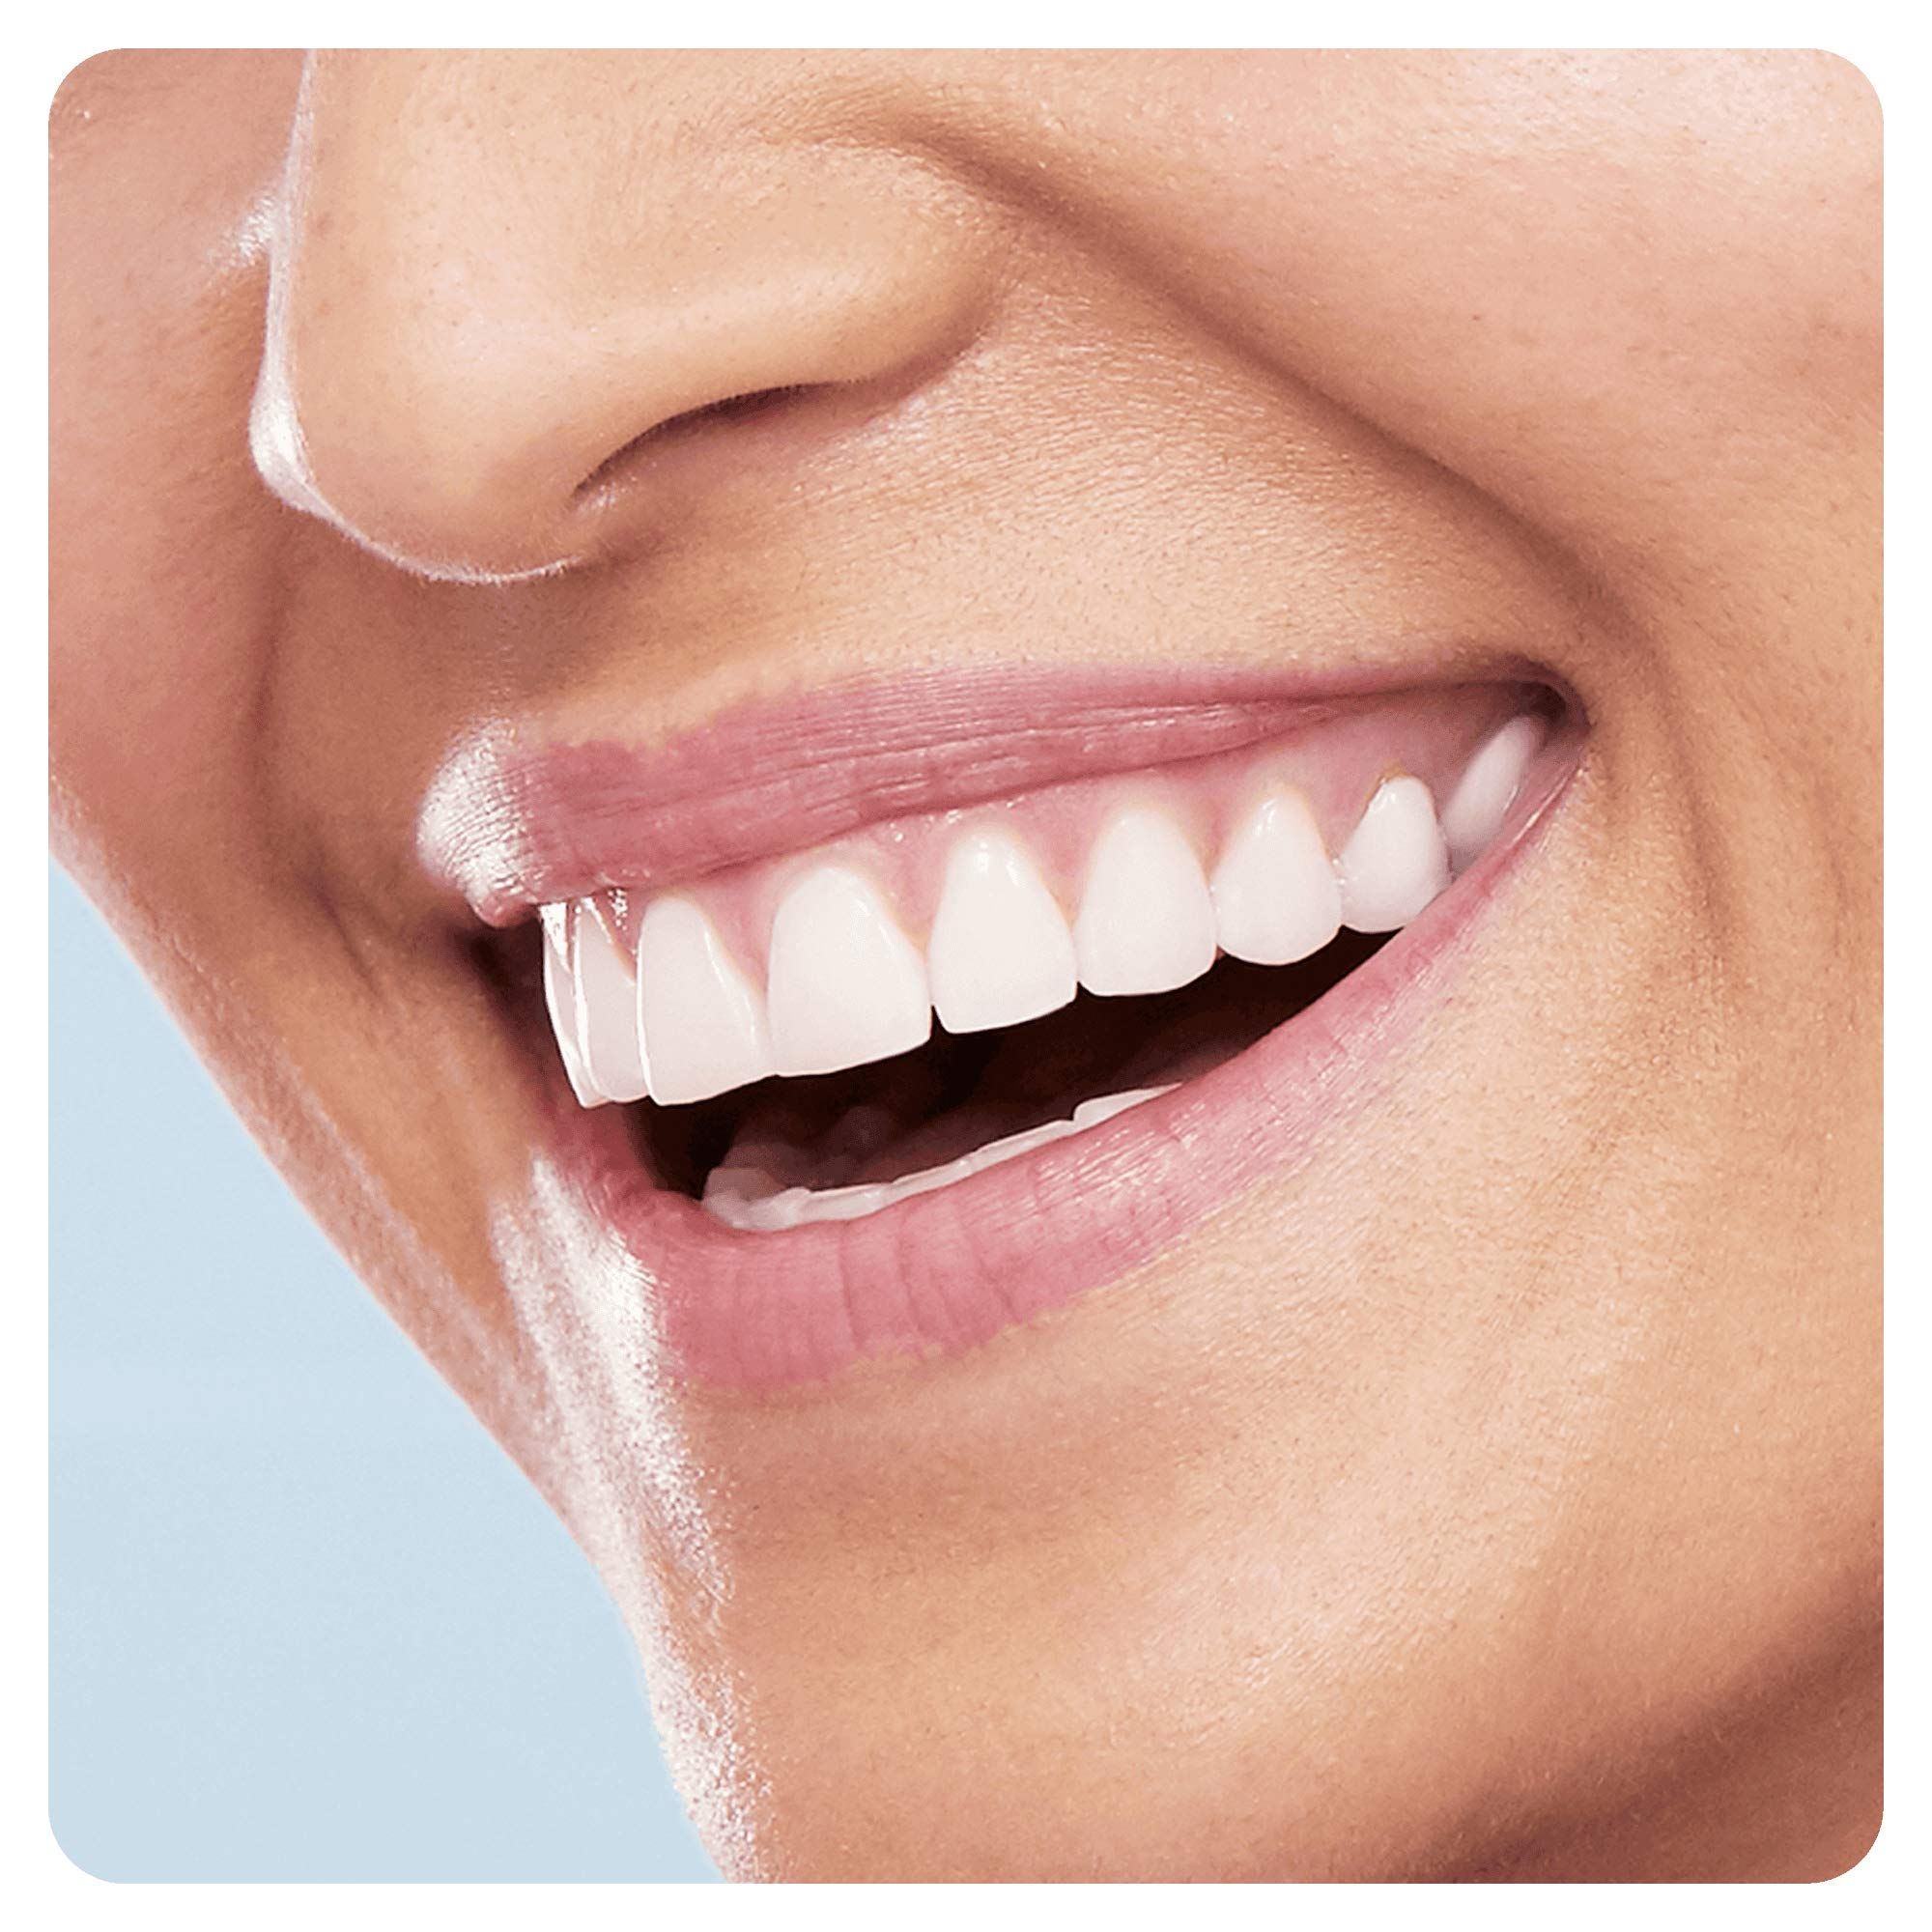 Braun Oral B Vitality 170 CrossAction Electric Toothbrush